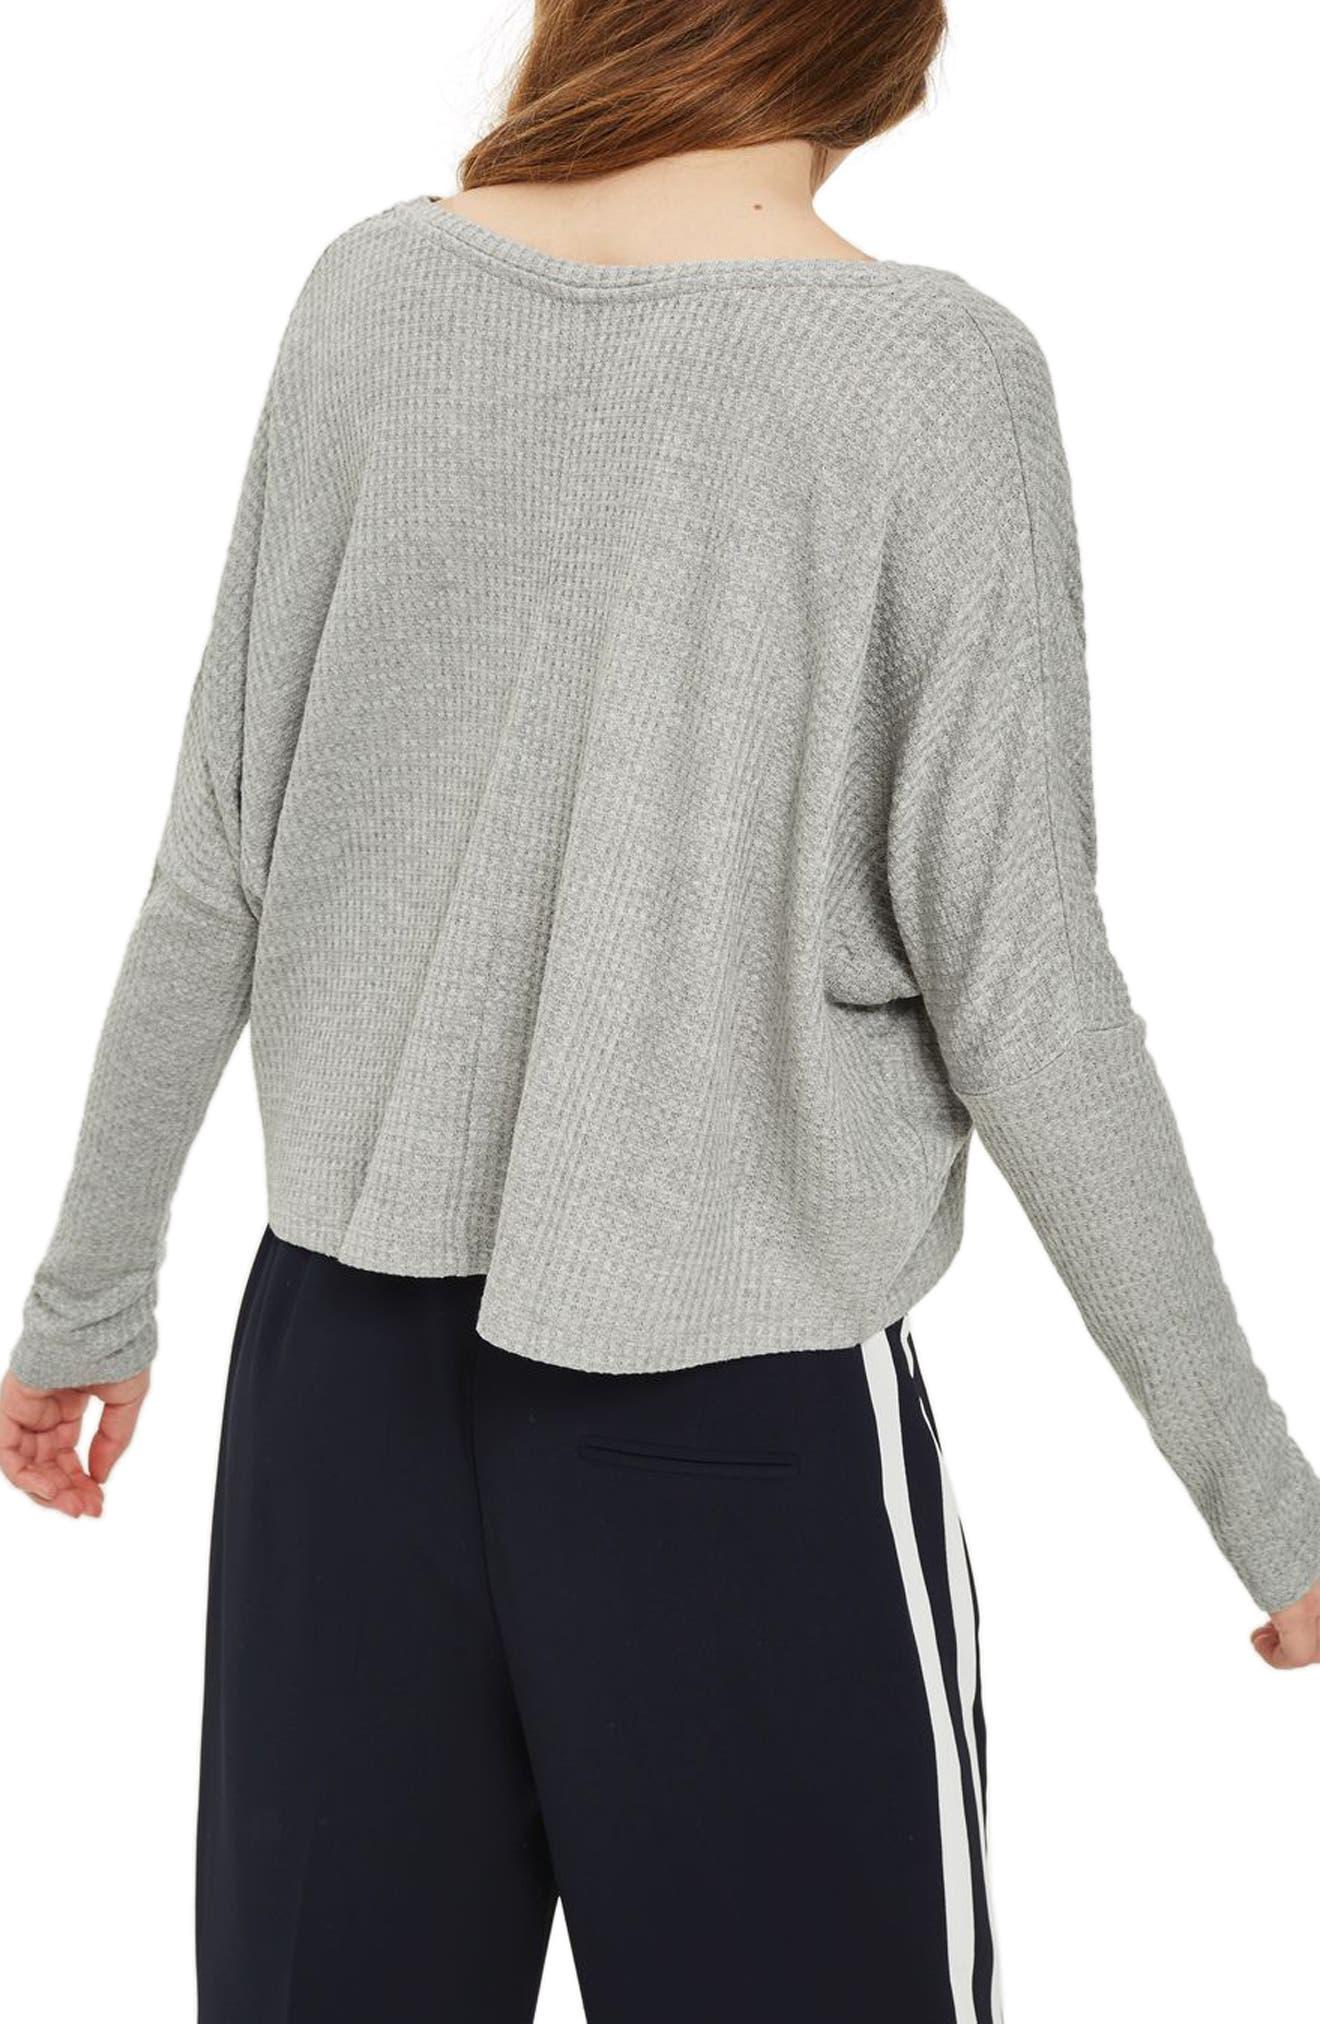 Waffle Knit Sweatshirt,                             Alternate thumbnail 2, color,                             Grey Marl